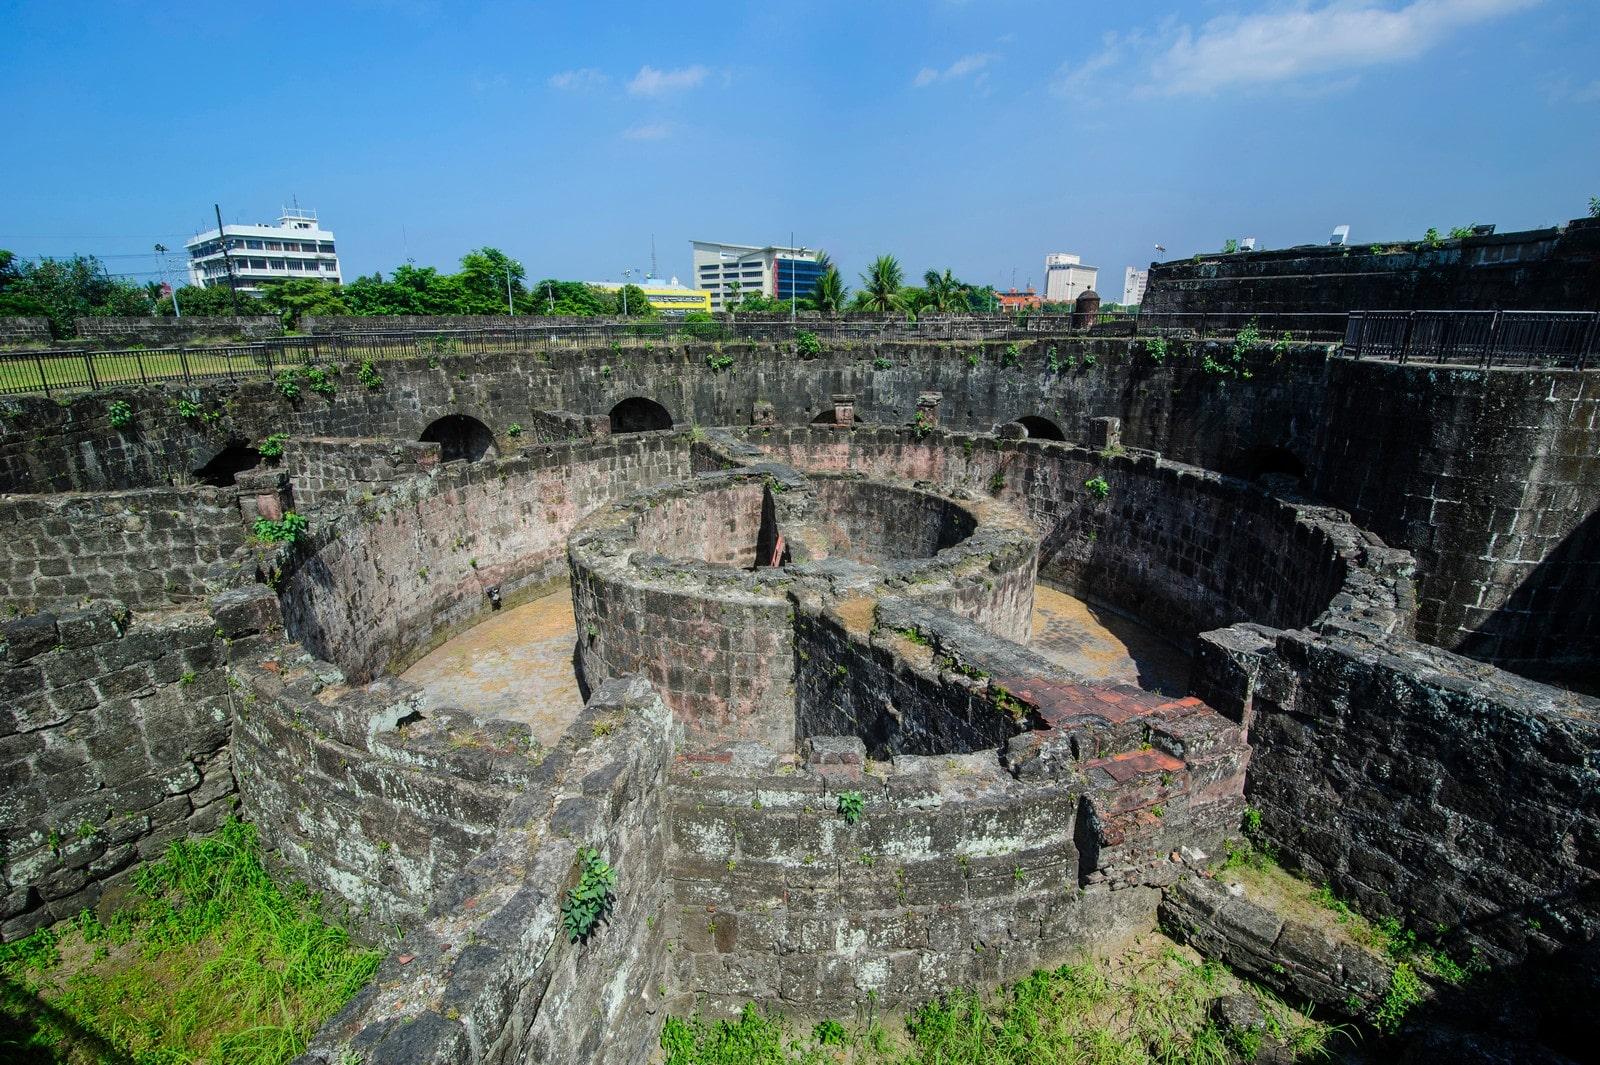 Baluarte de Santiago inside the walled city of Intramuros